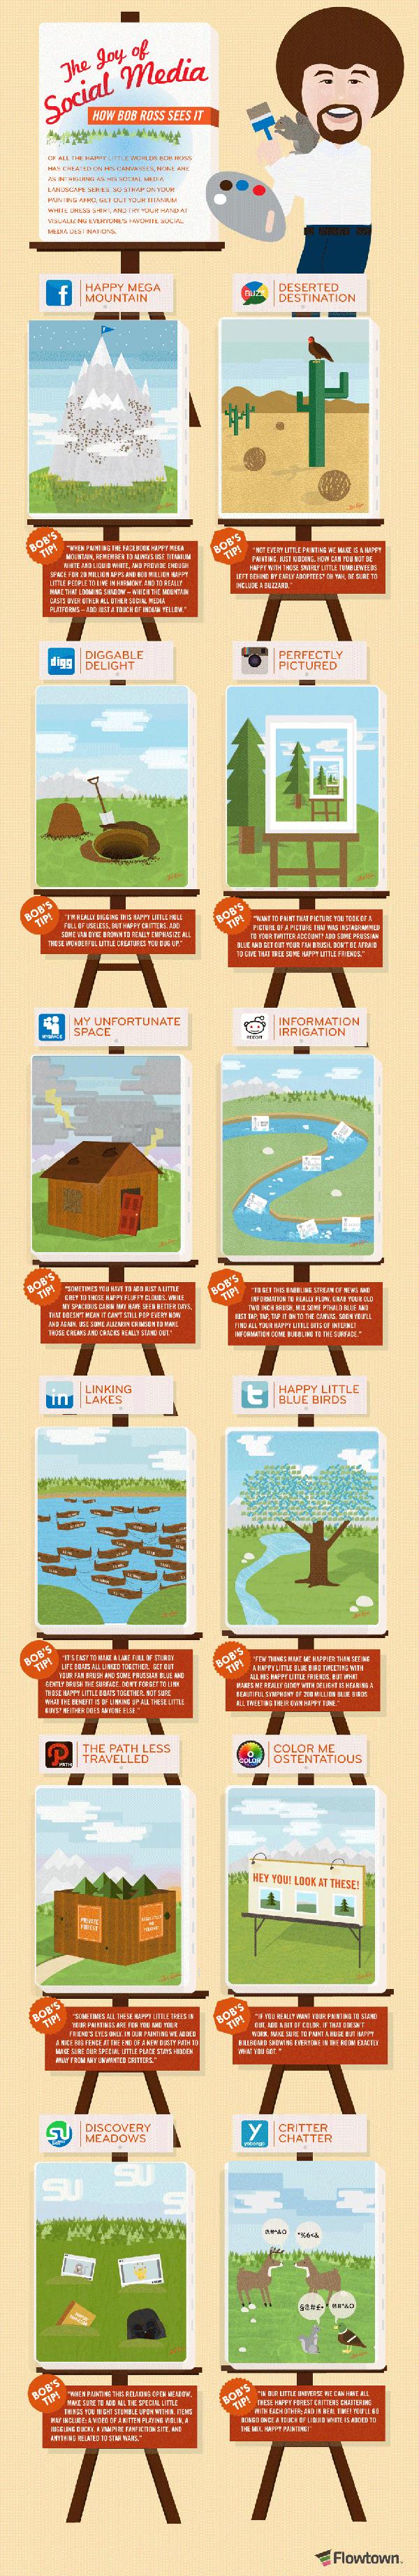 Social media e paesaggi - infographic